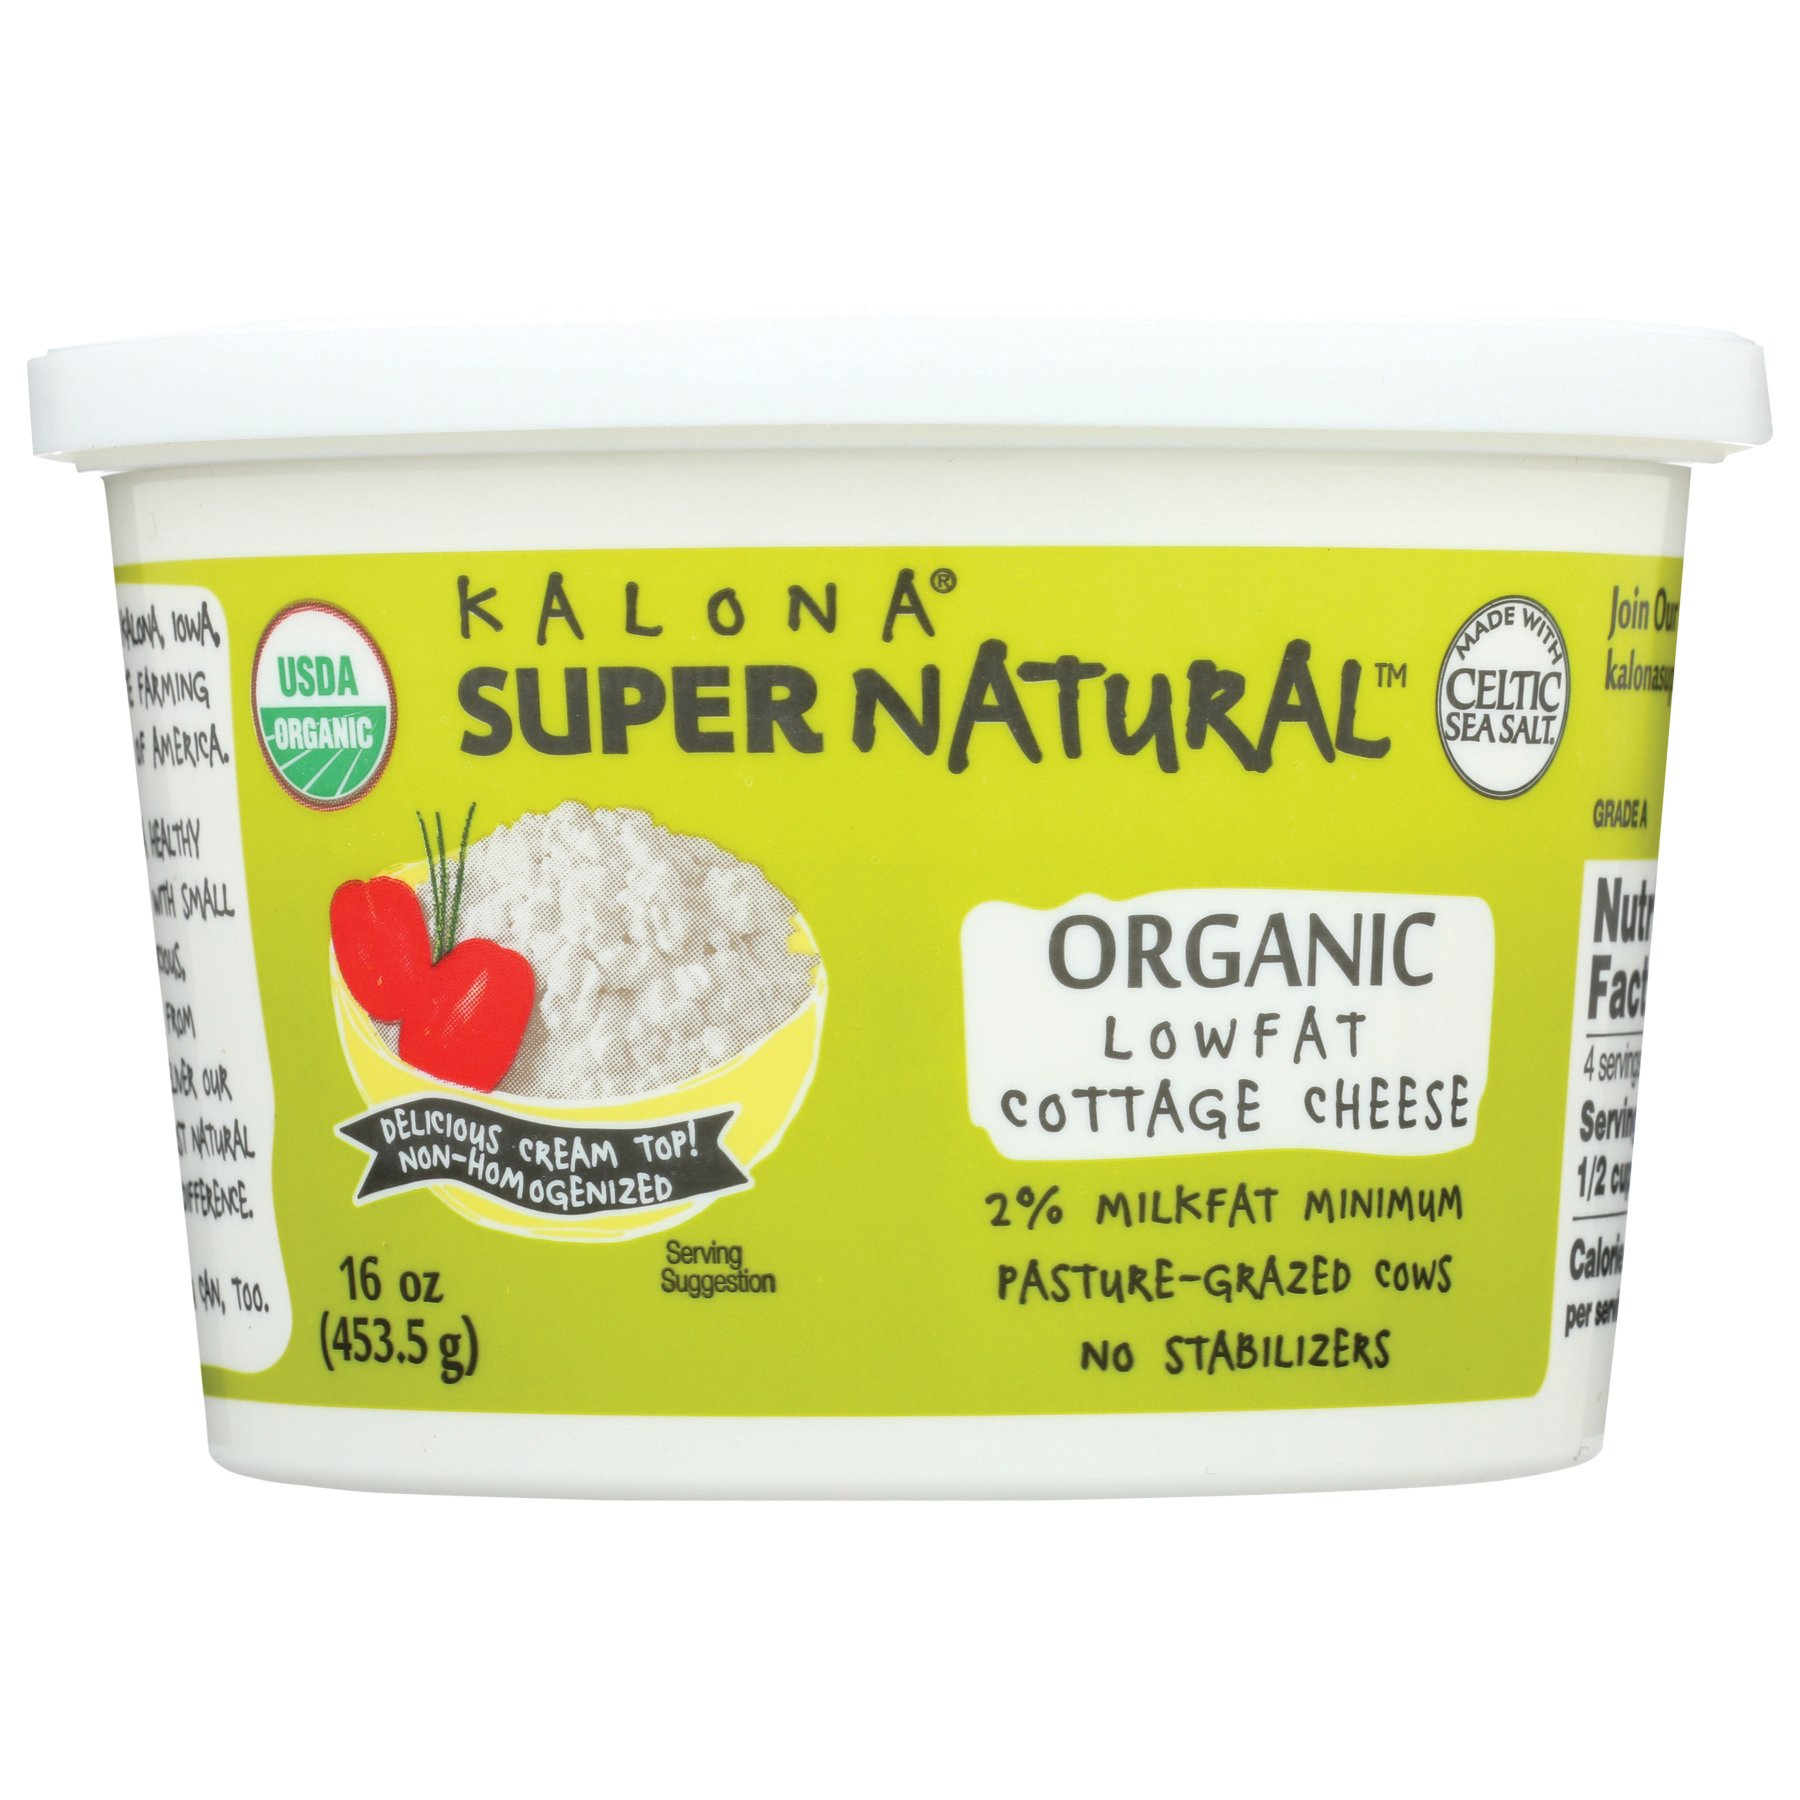 Kalona Supernatural Organic Lowfat Cottage Cheese Shop Cottage Cheese At H E B